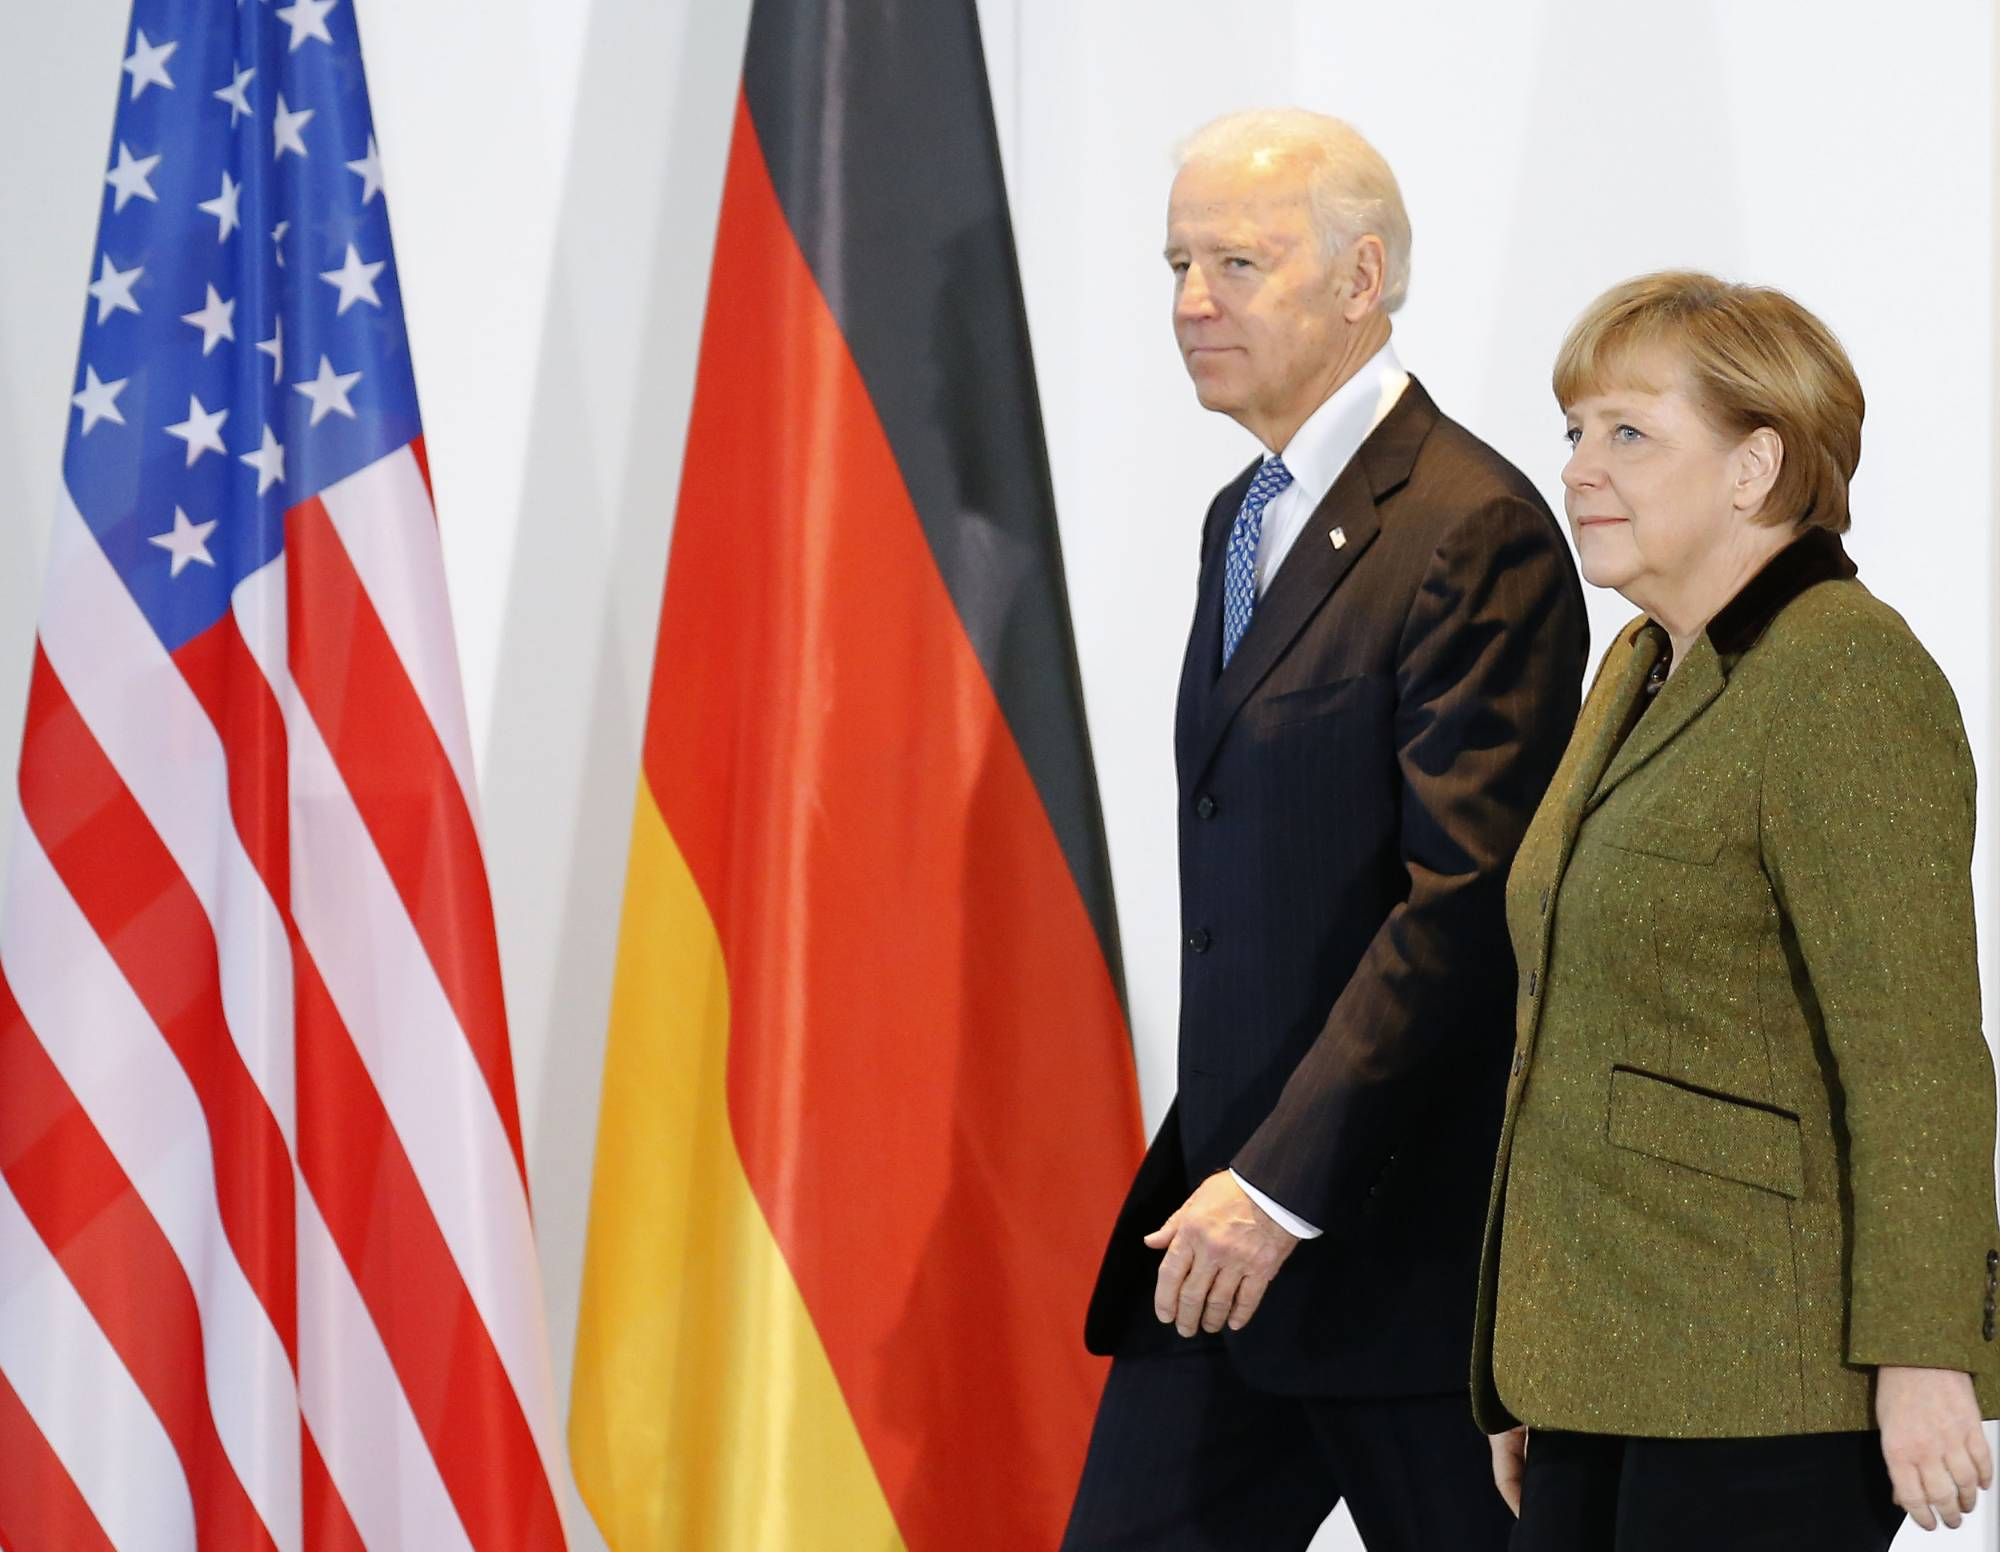 German Chancellor Merkel and U.S. Vice President Biden arrive to make statement to media in Berlin